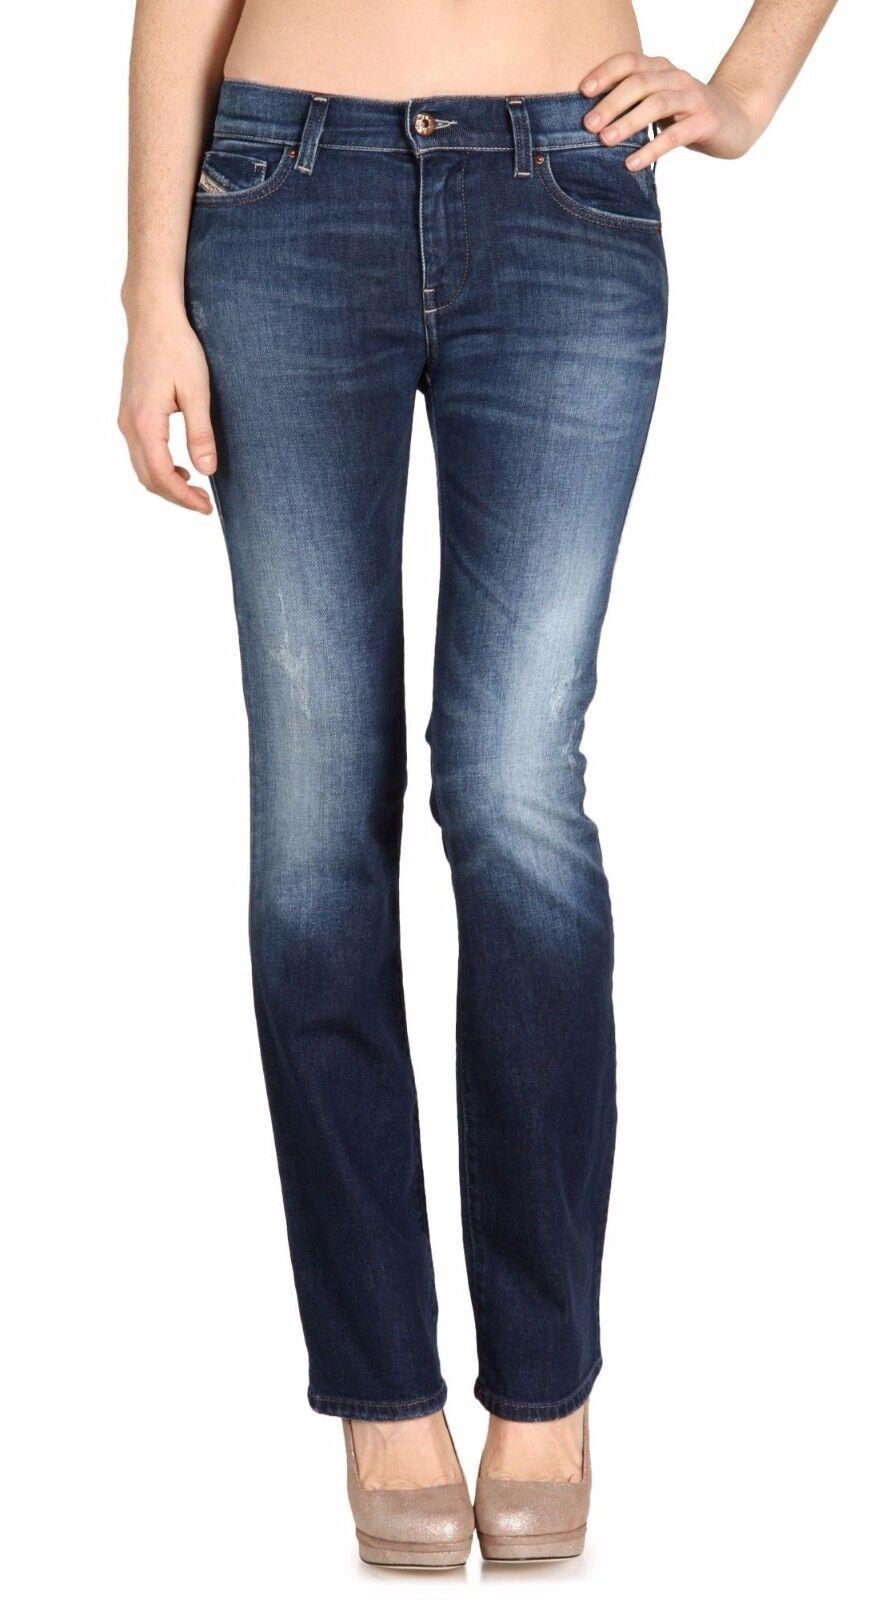 Diesel BOOTZEE Bootcut Regular Waist Slim Fit Jeans 0808T Medium 24x32 Nwt  198